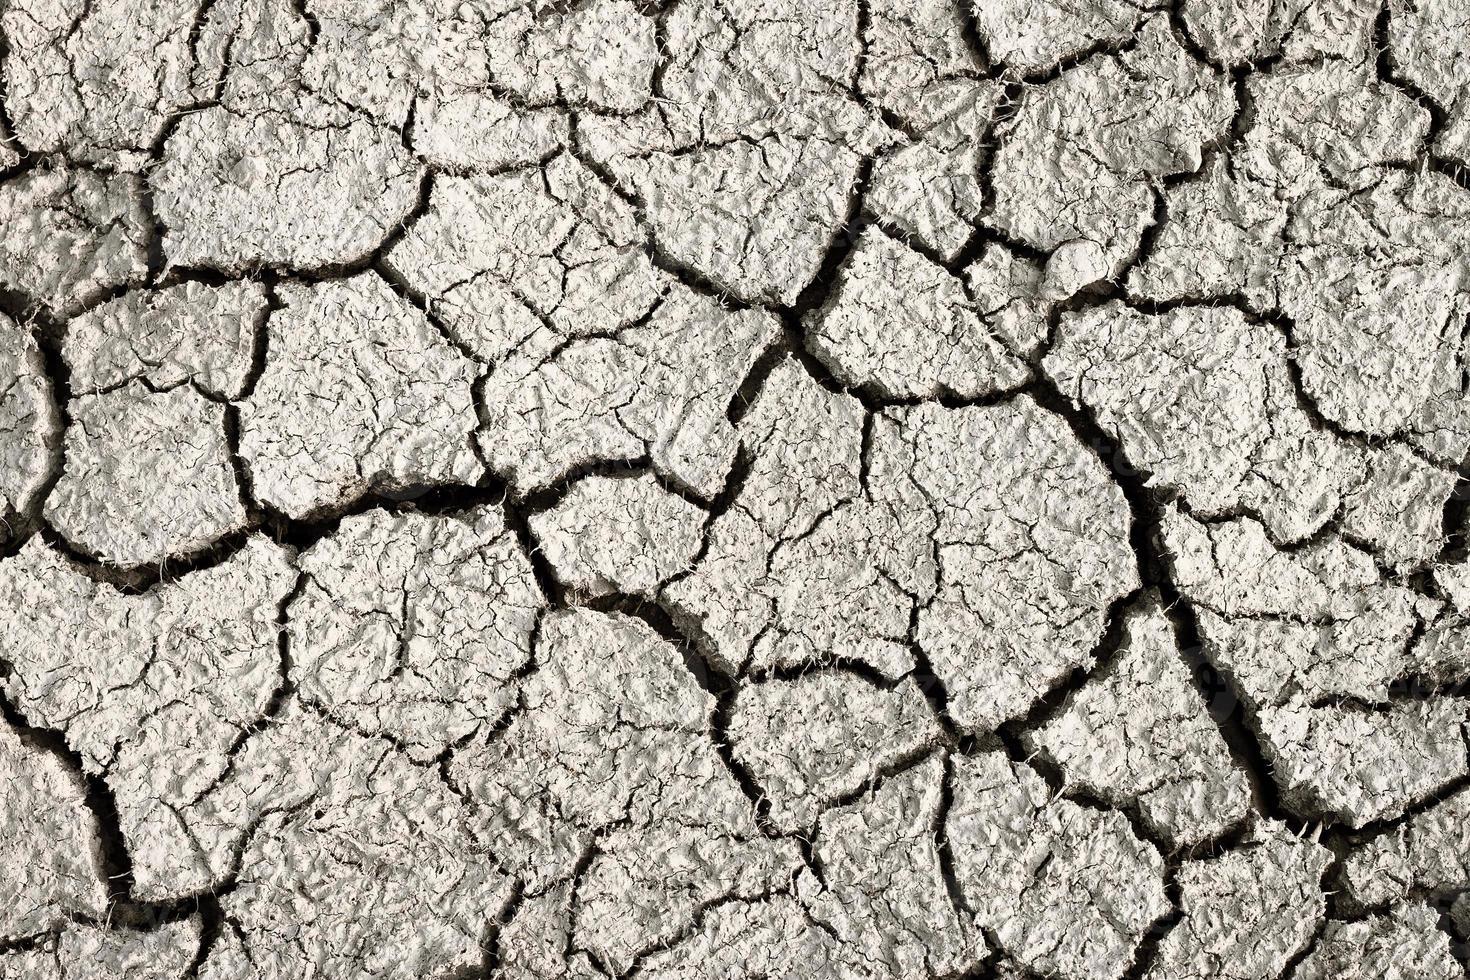 Cracks in dry earth photo